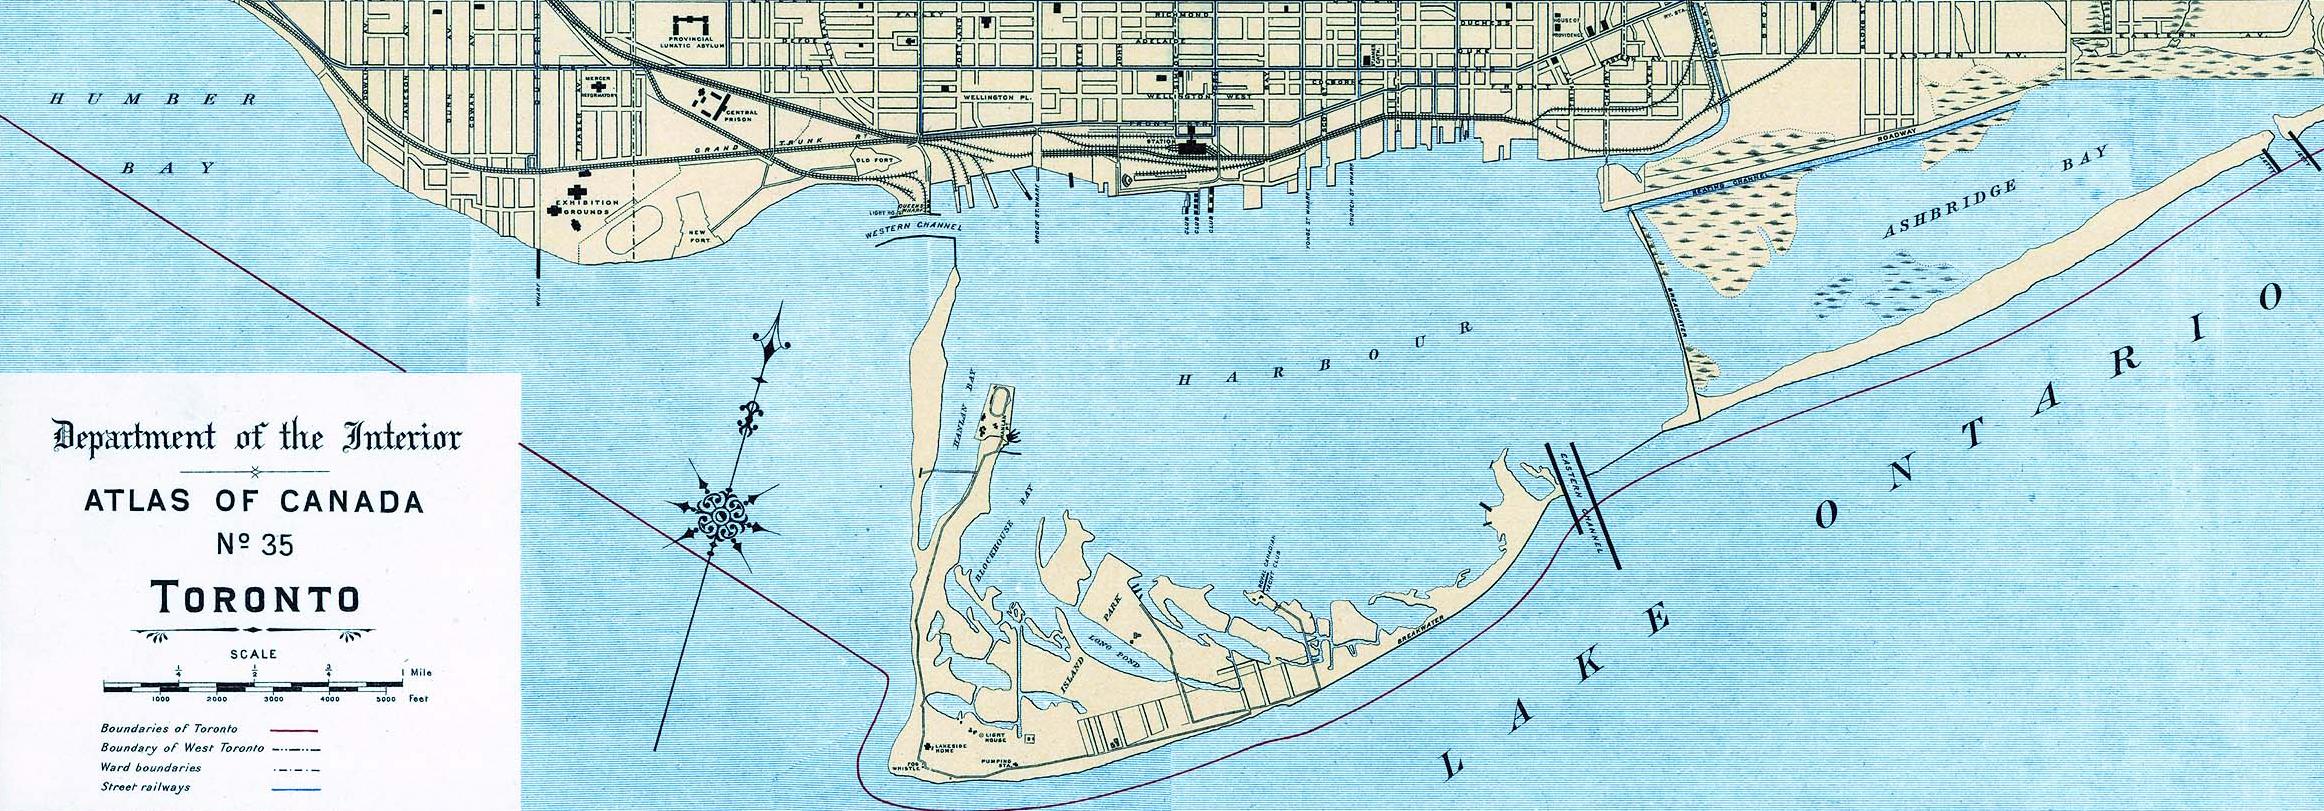 Toronto Islands Government